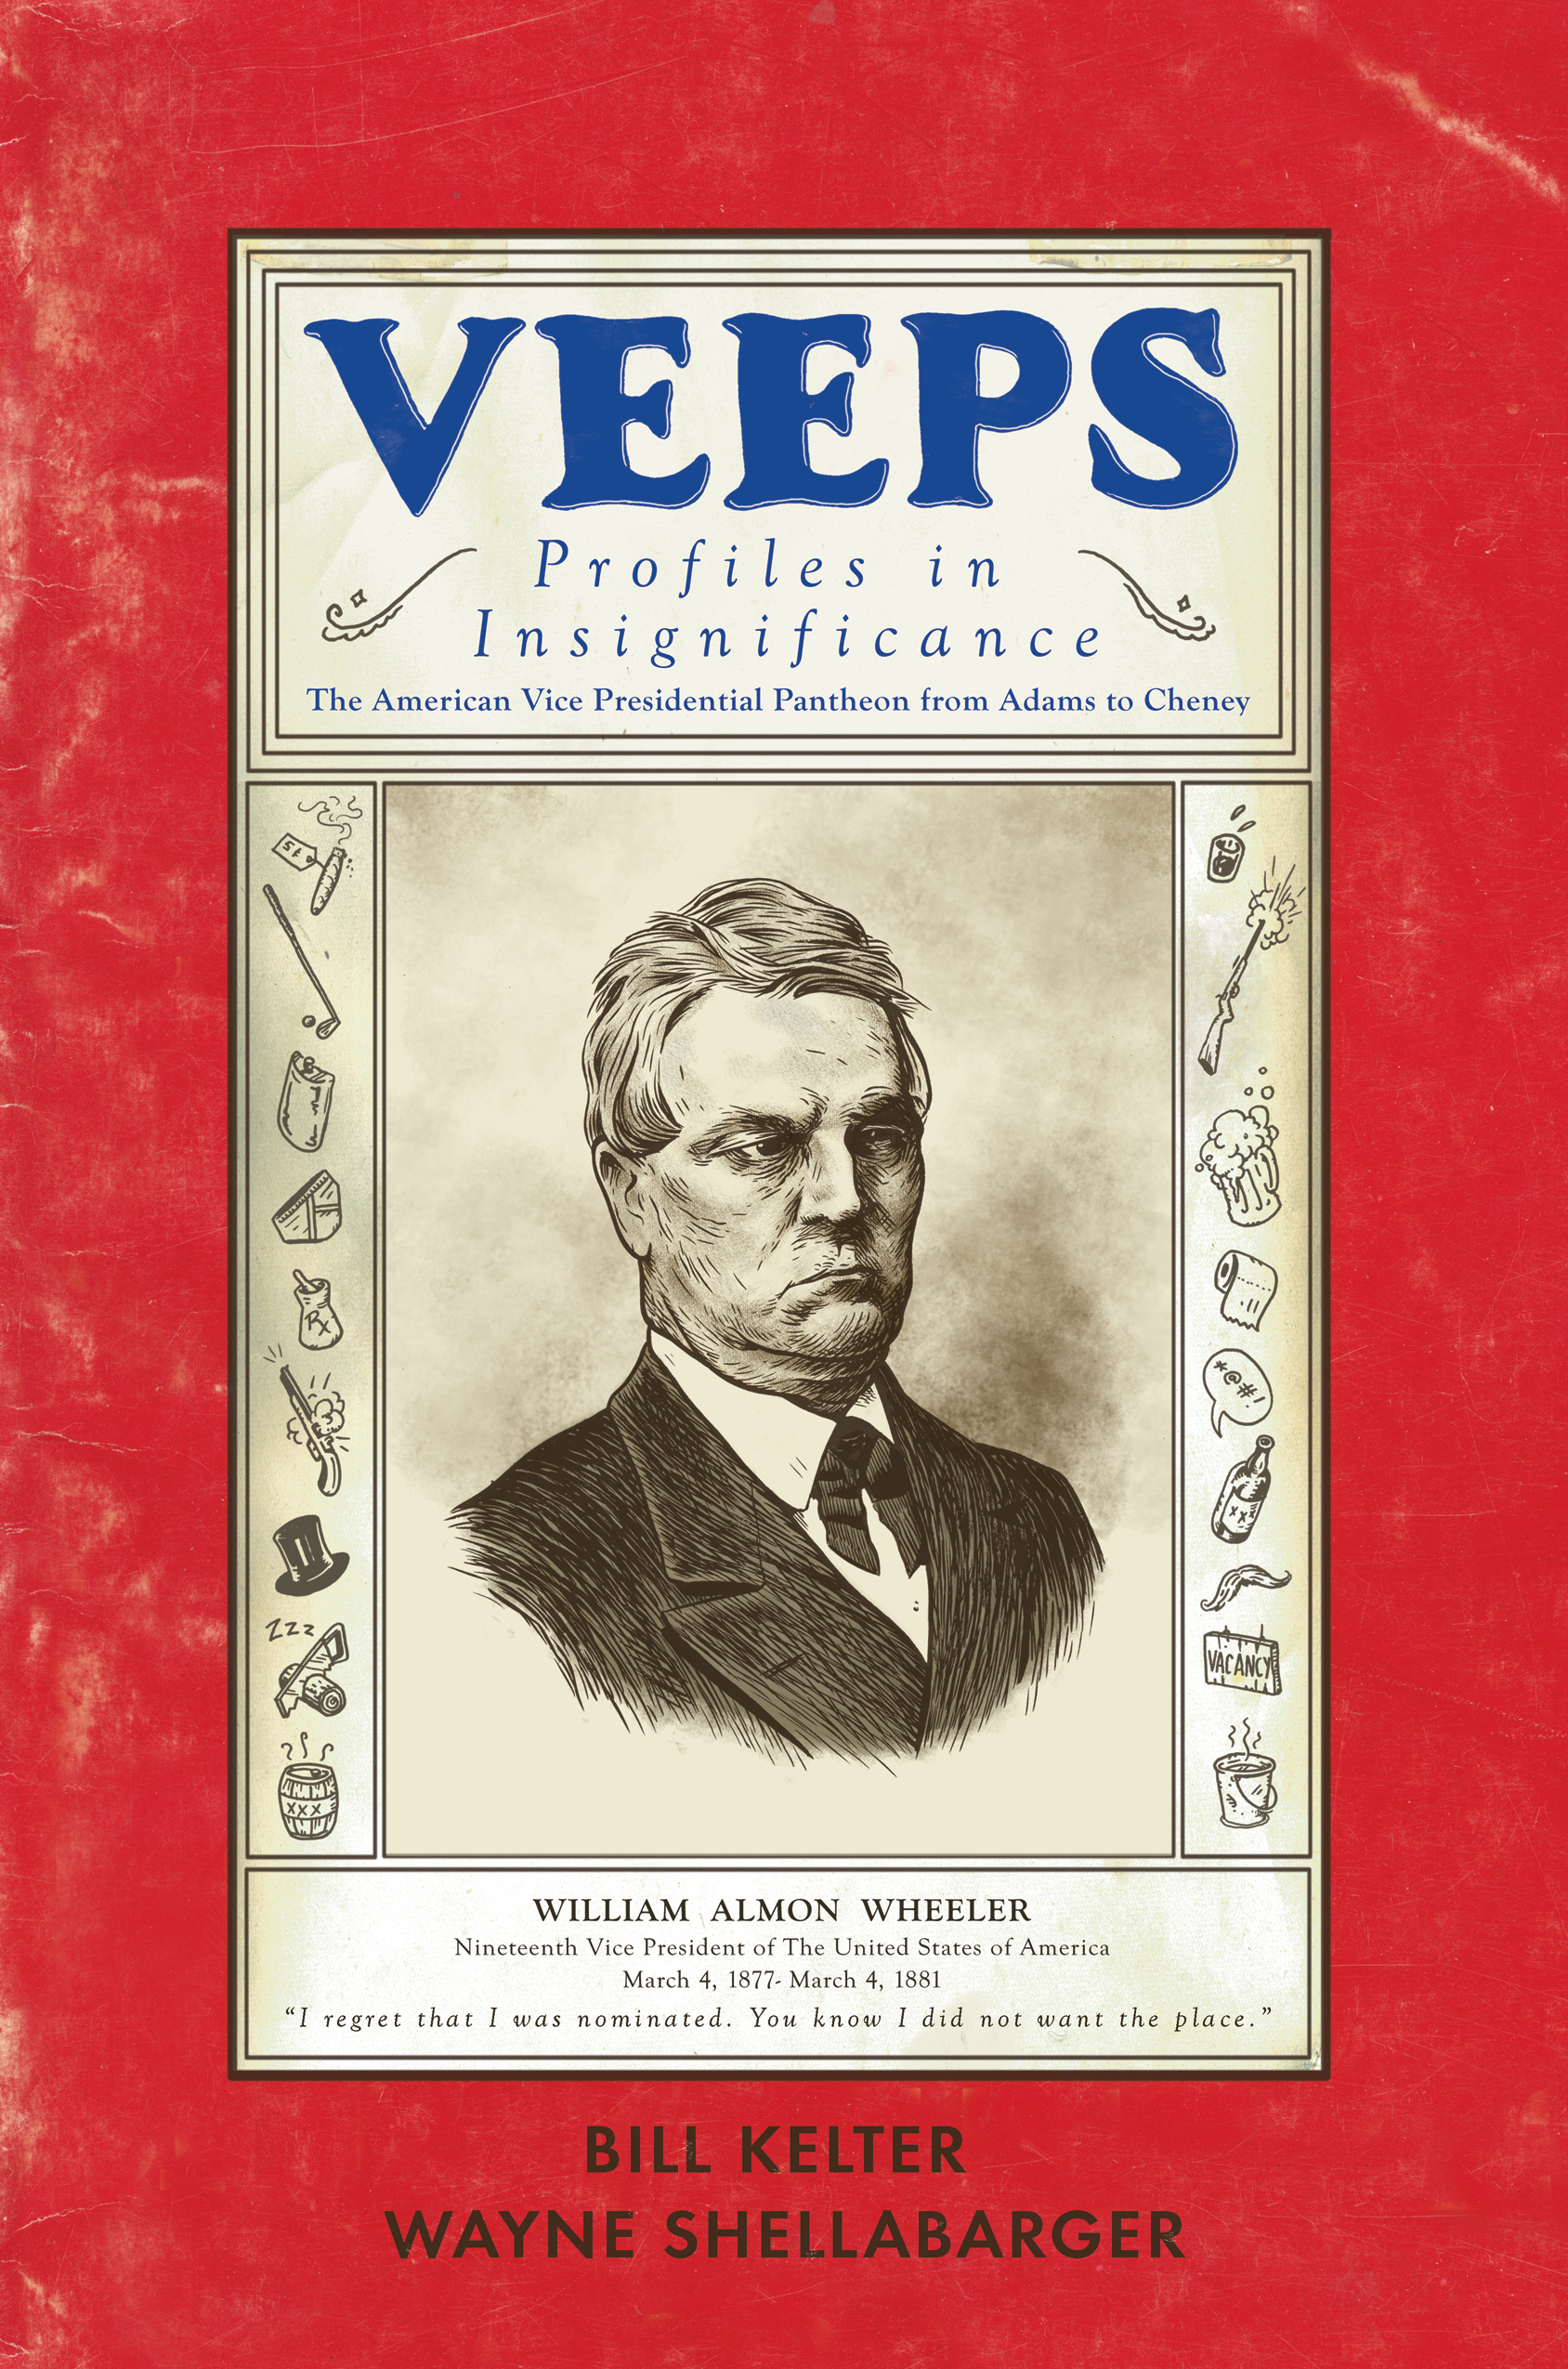 veeps, book, history, Wayne Shellabarger, Illustration, poster, vice president, vice presidents,